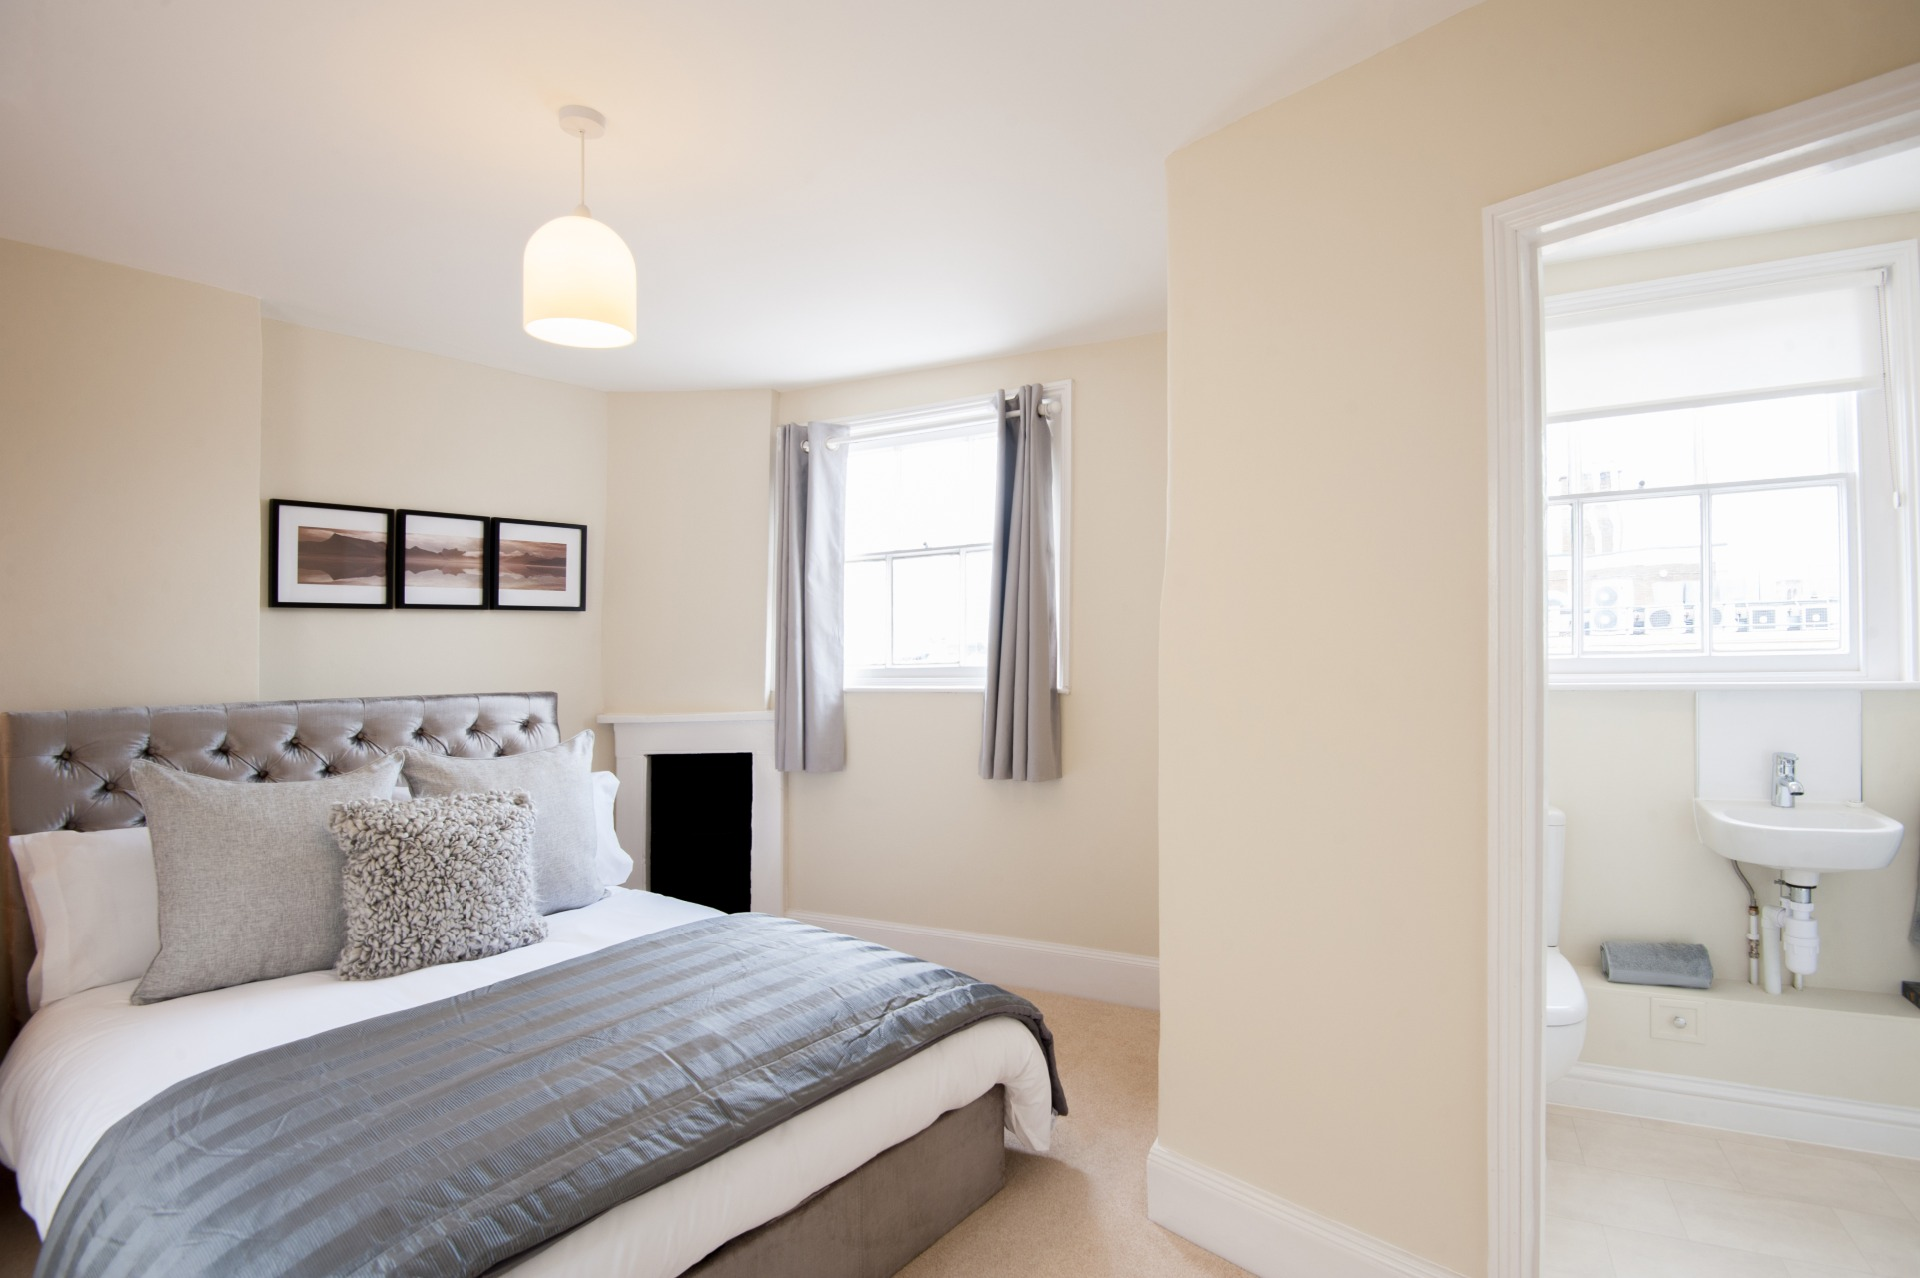 Bedroom at High Street Duplex Apartment